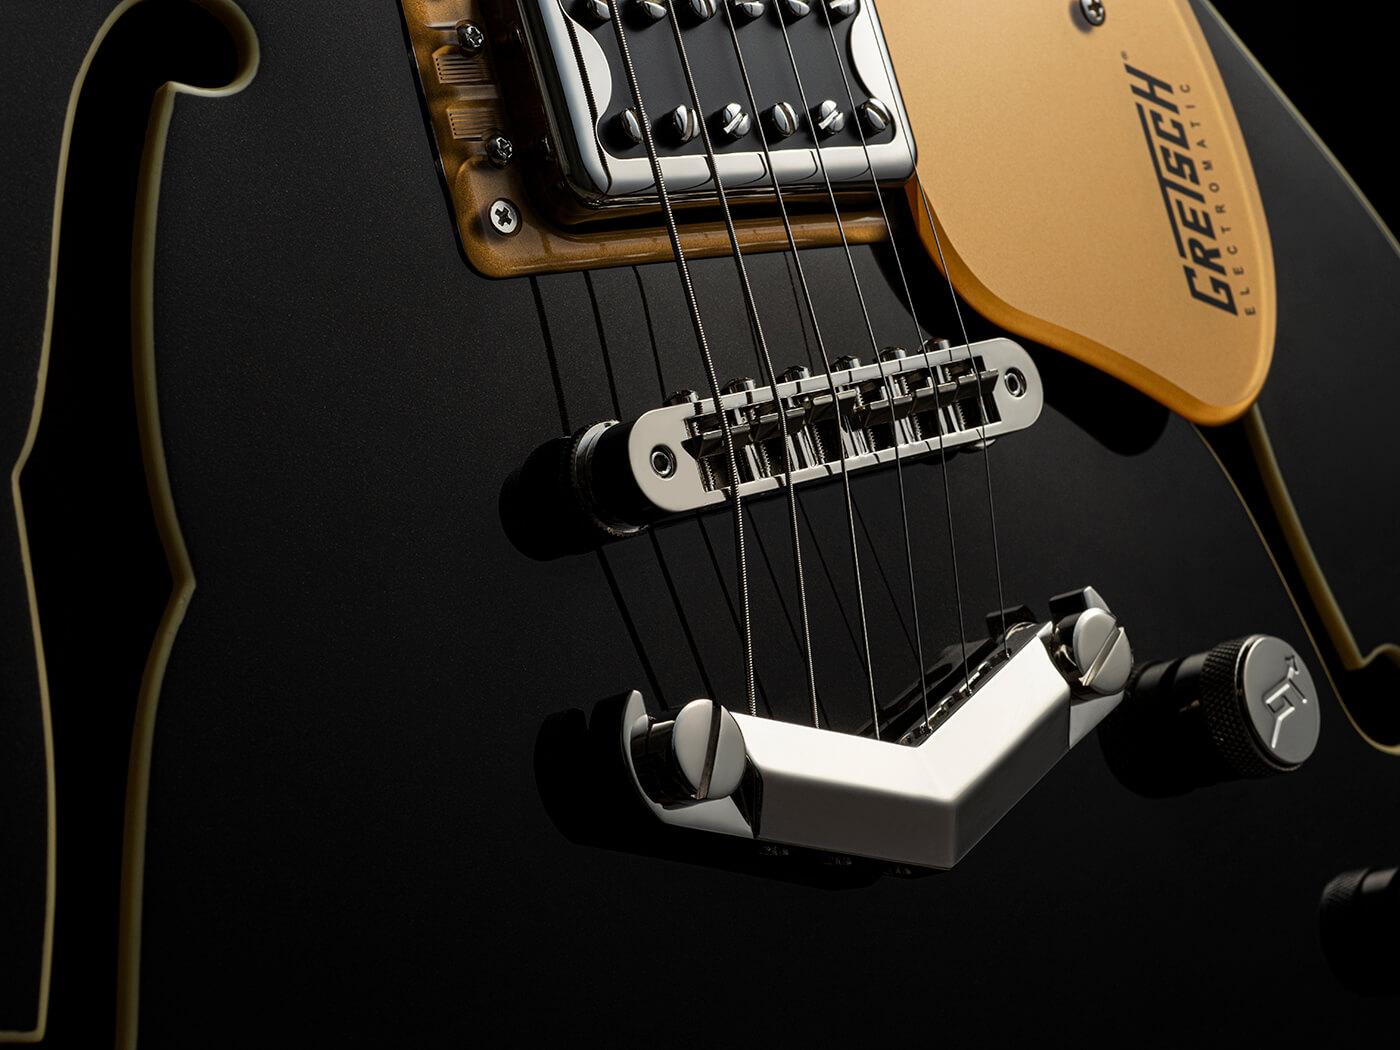 Gretsch G5622 Electromatic Center Block Double-Cut